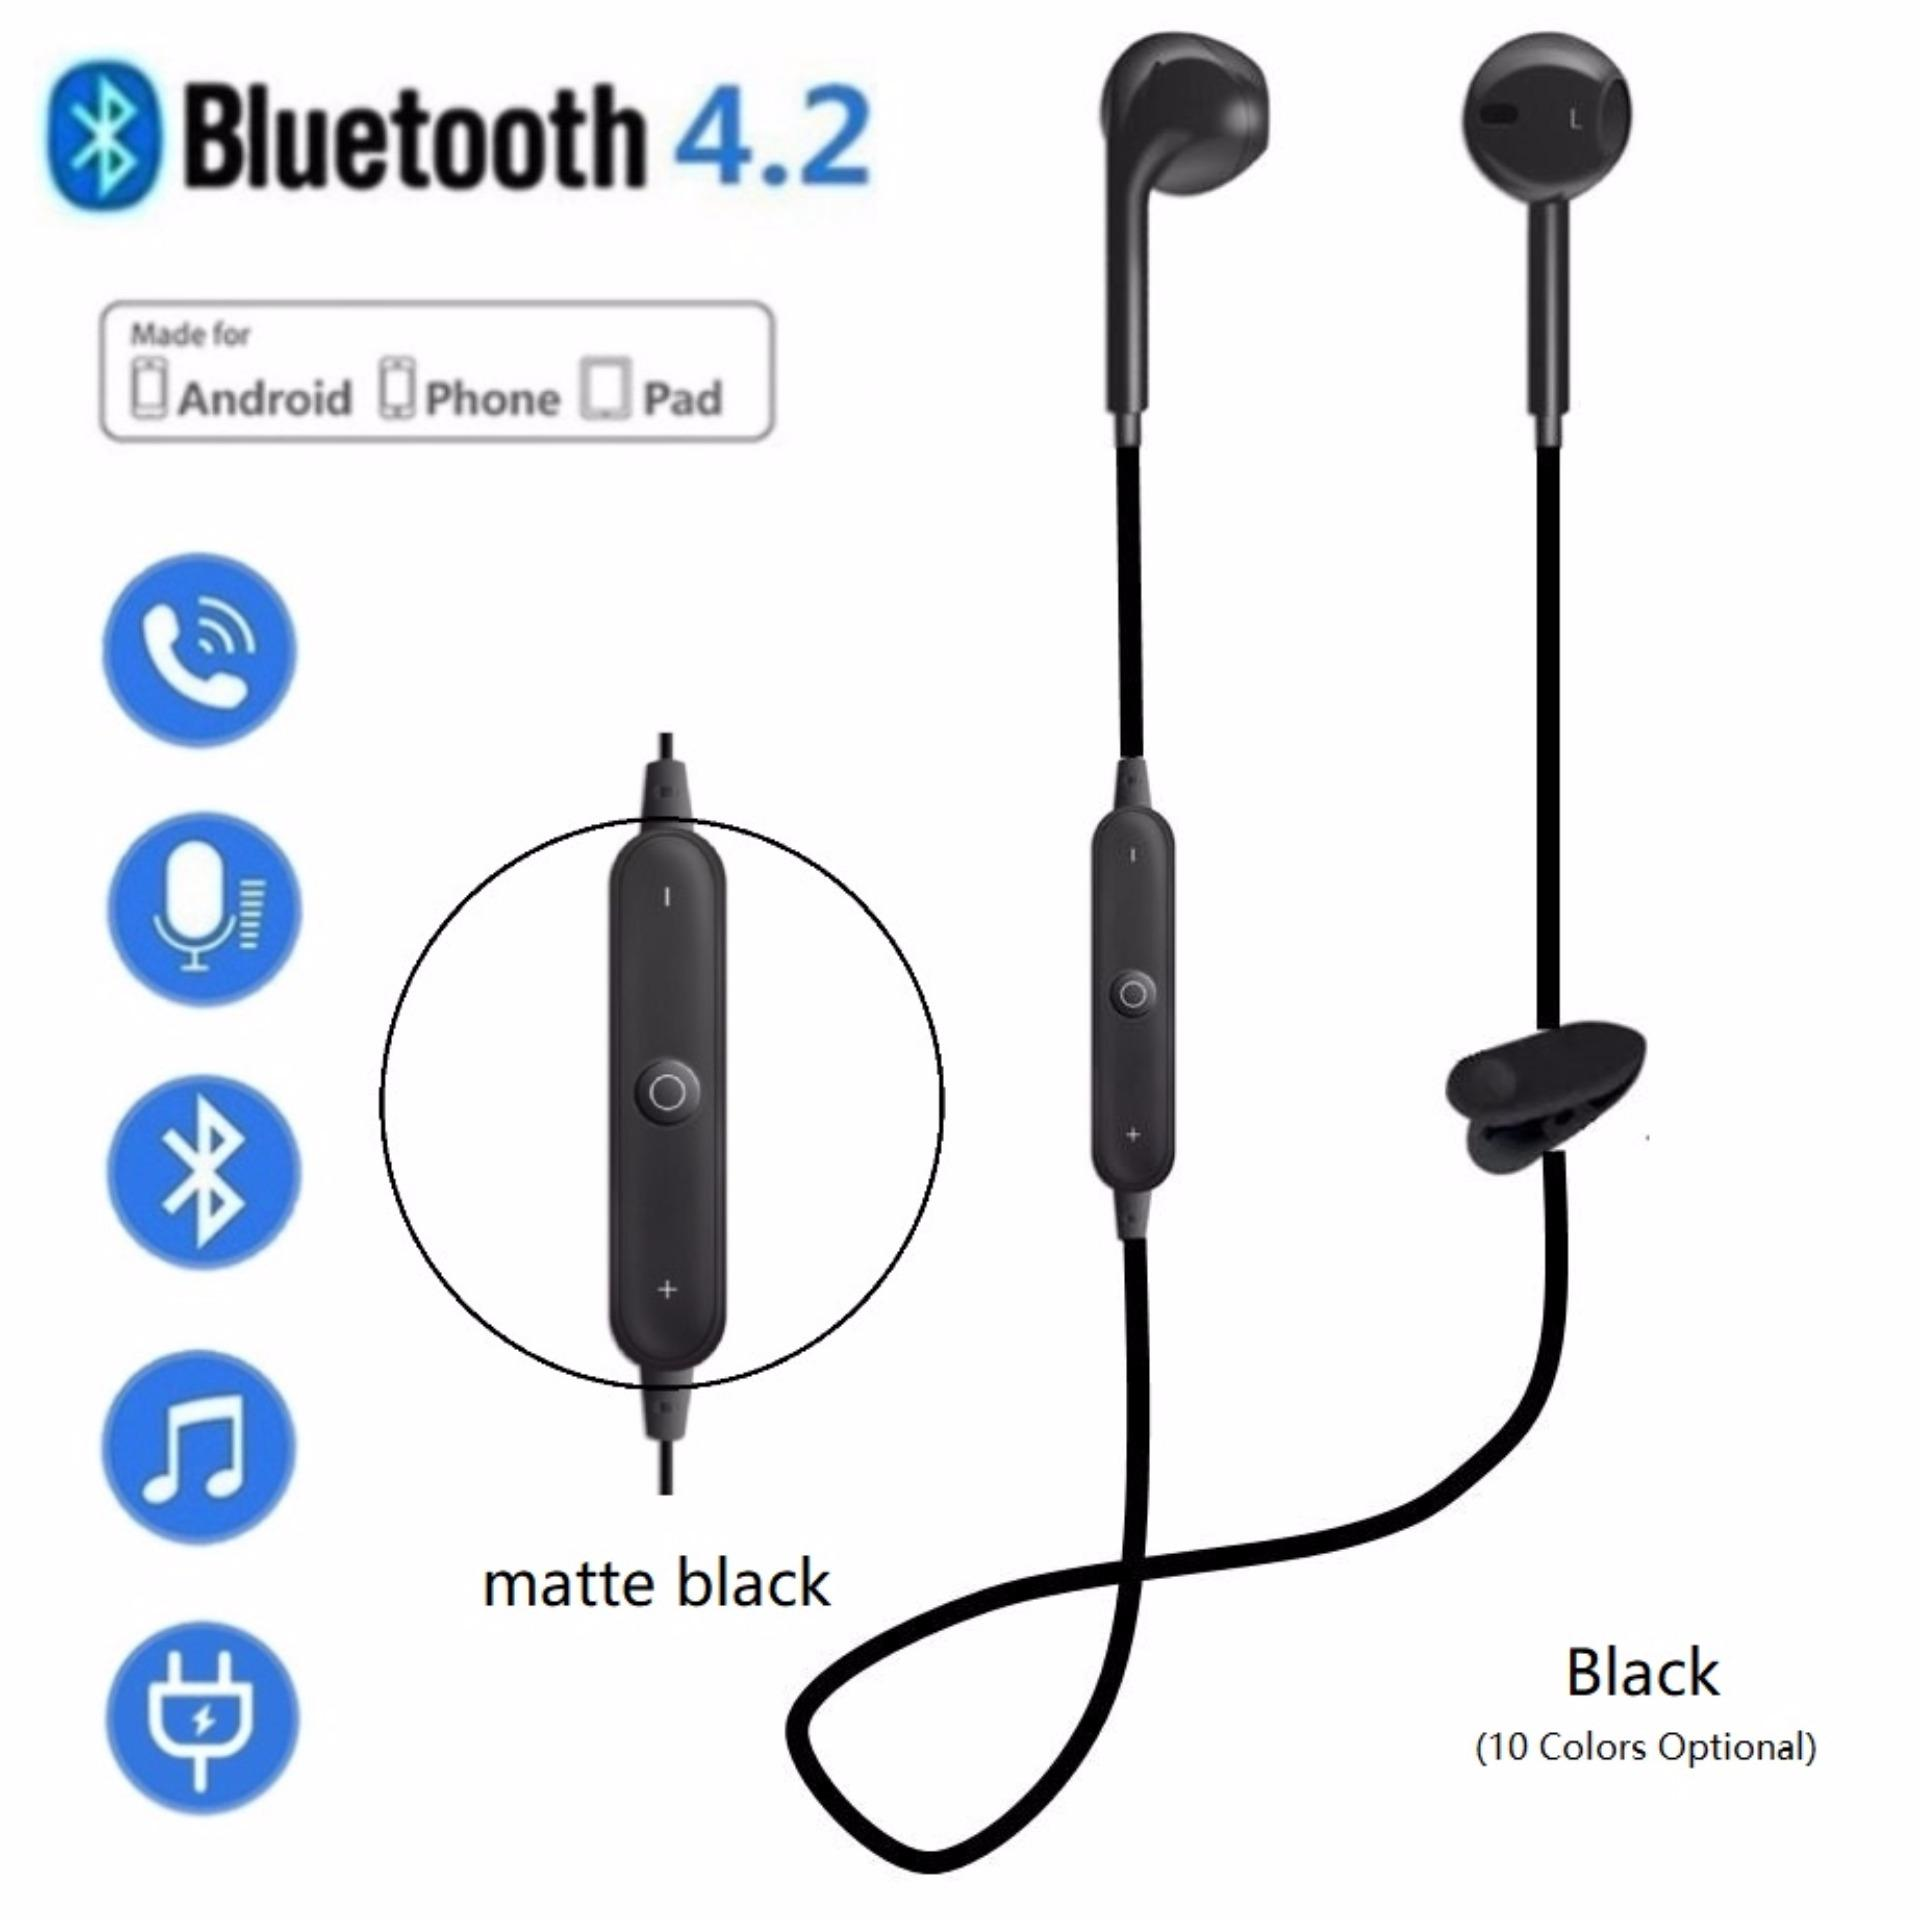 Baru Uniseks Nirkabel Bluetooth Stereo Olahraga Headset Penyumbat Telinga Earphone S Di Telinga Pintar Stereo Musik